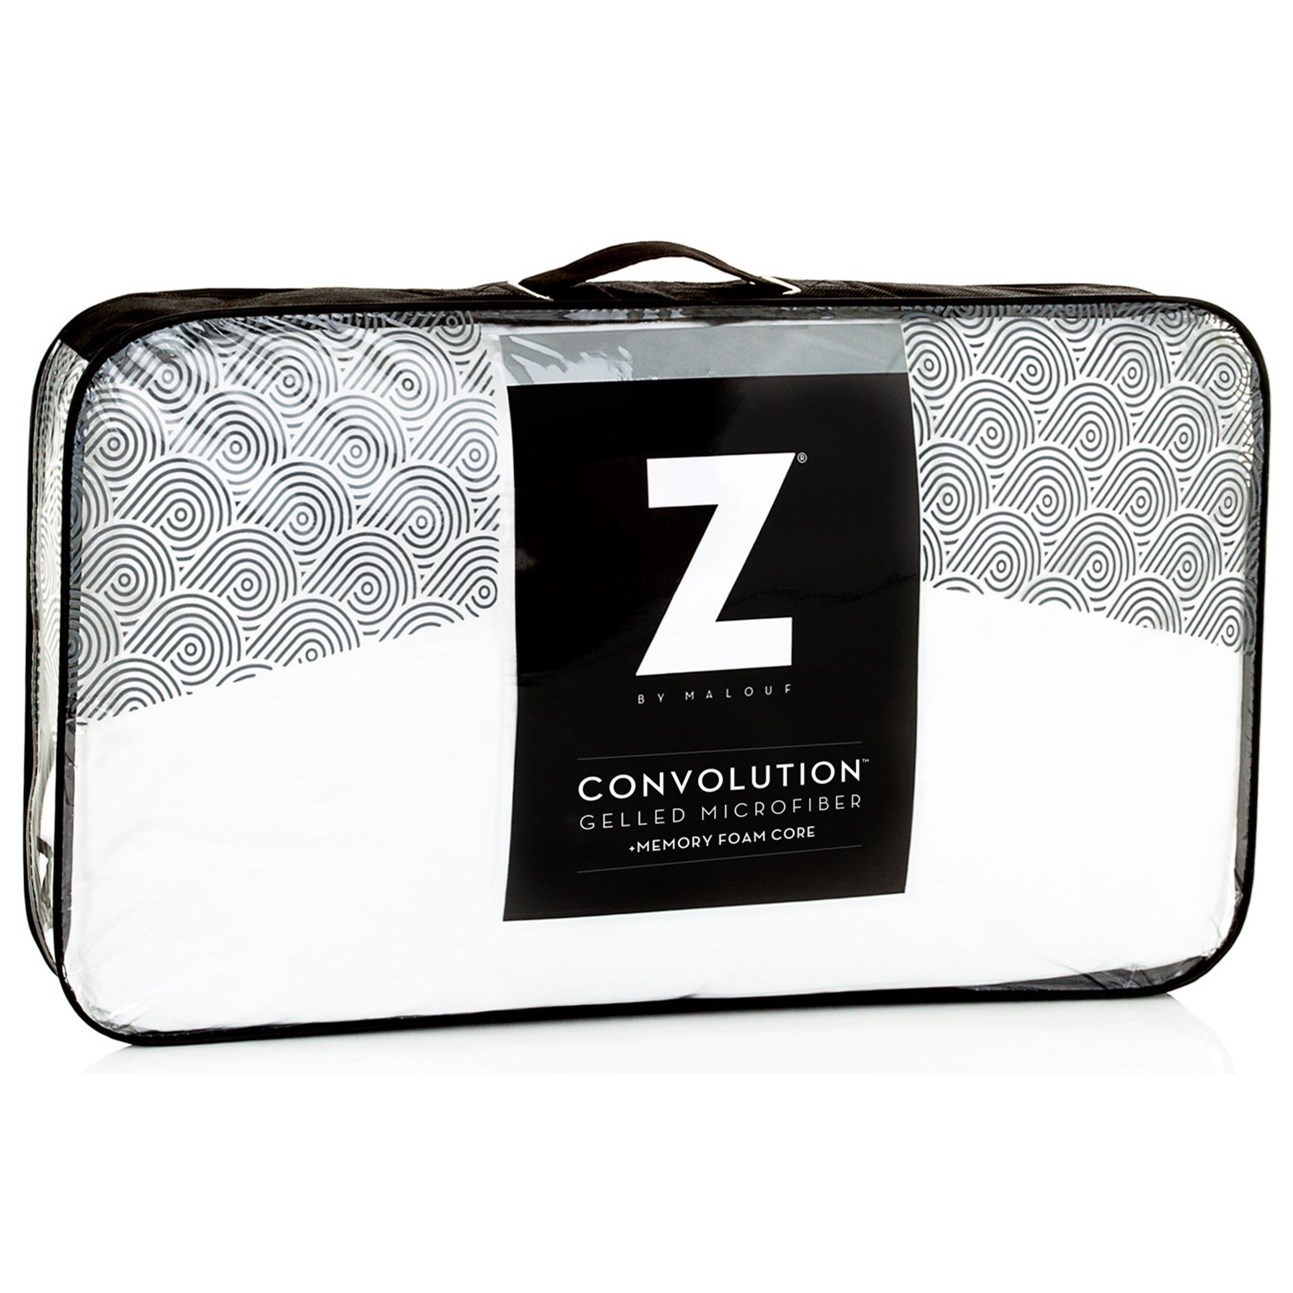 Convolution™ Queen Convolution™ Pillow by Malouf at Rotmans